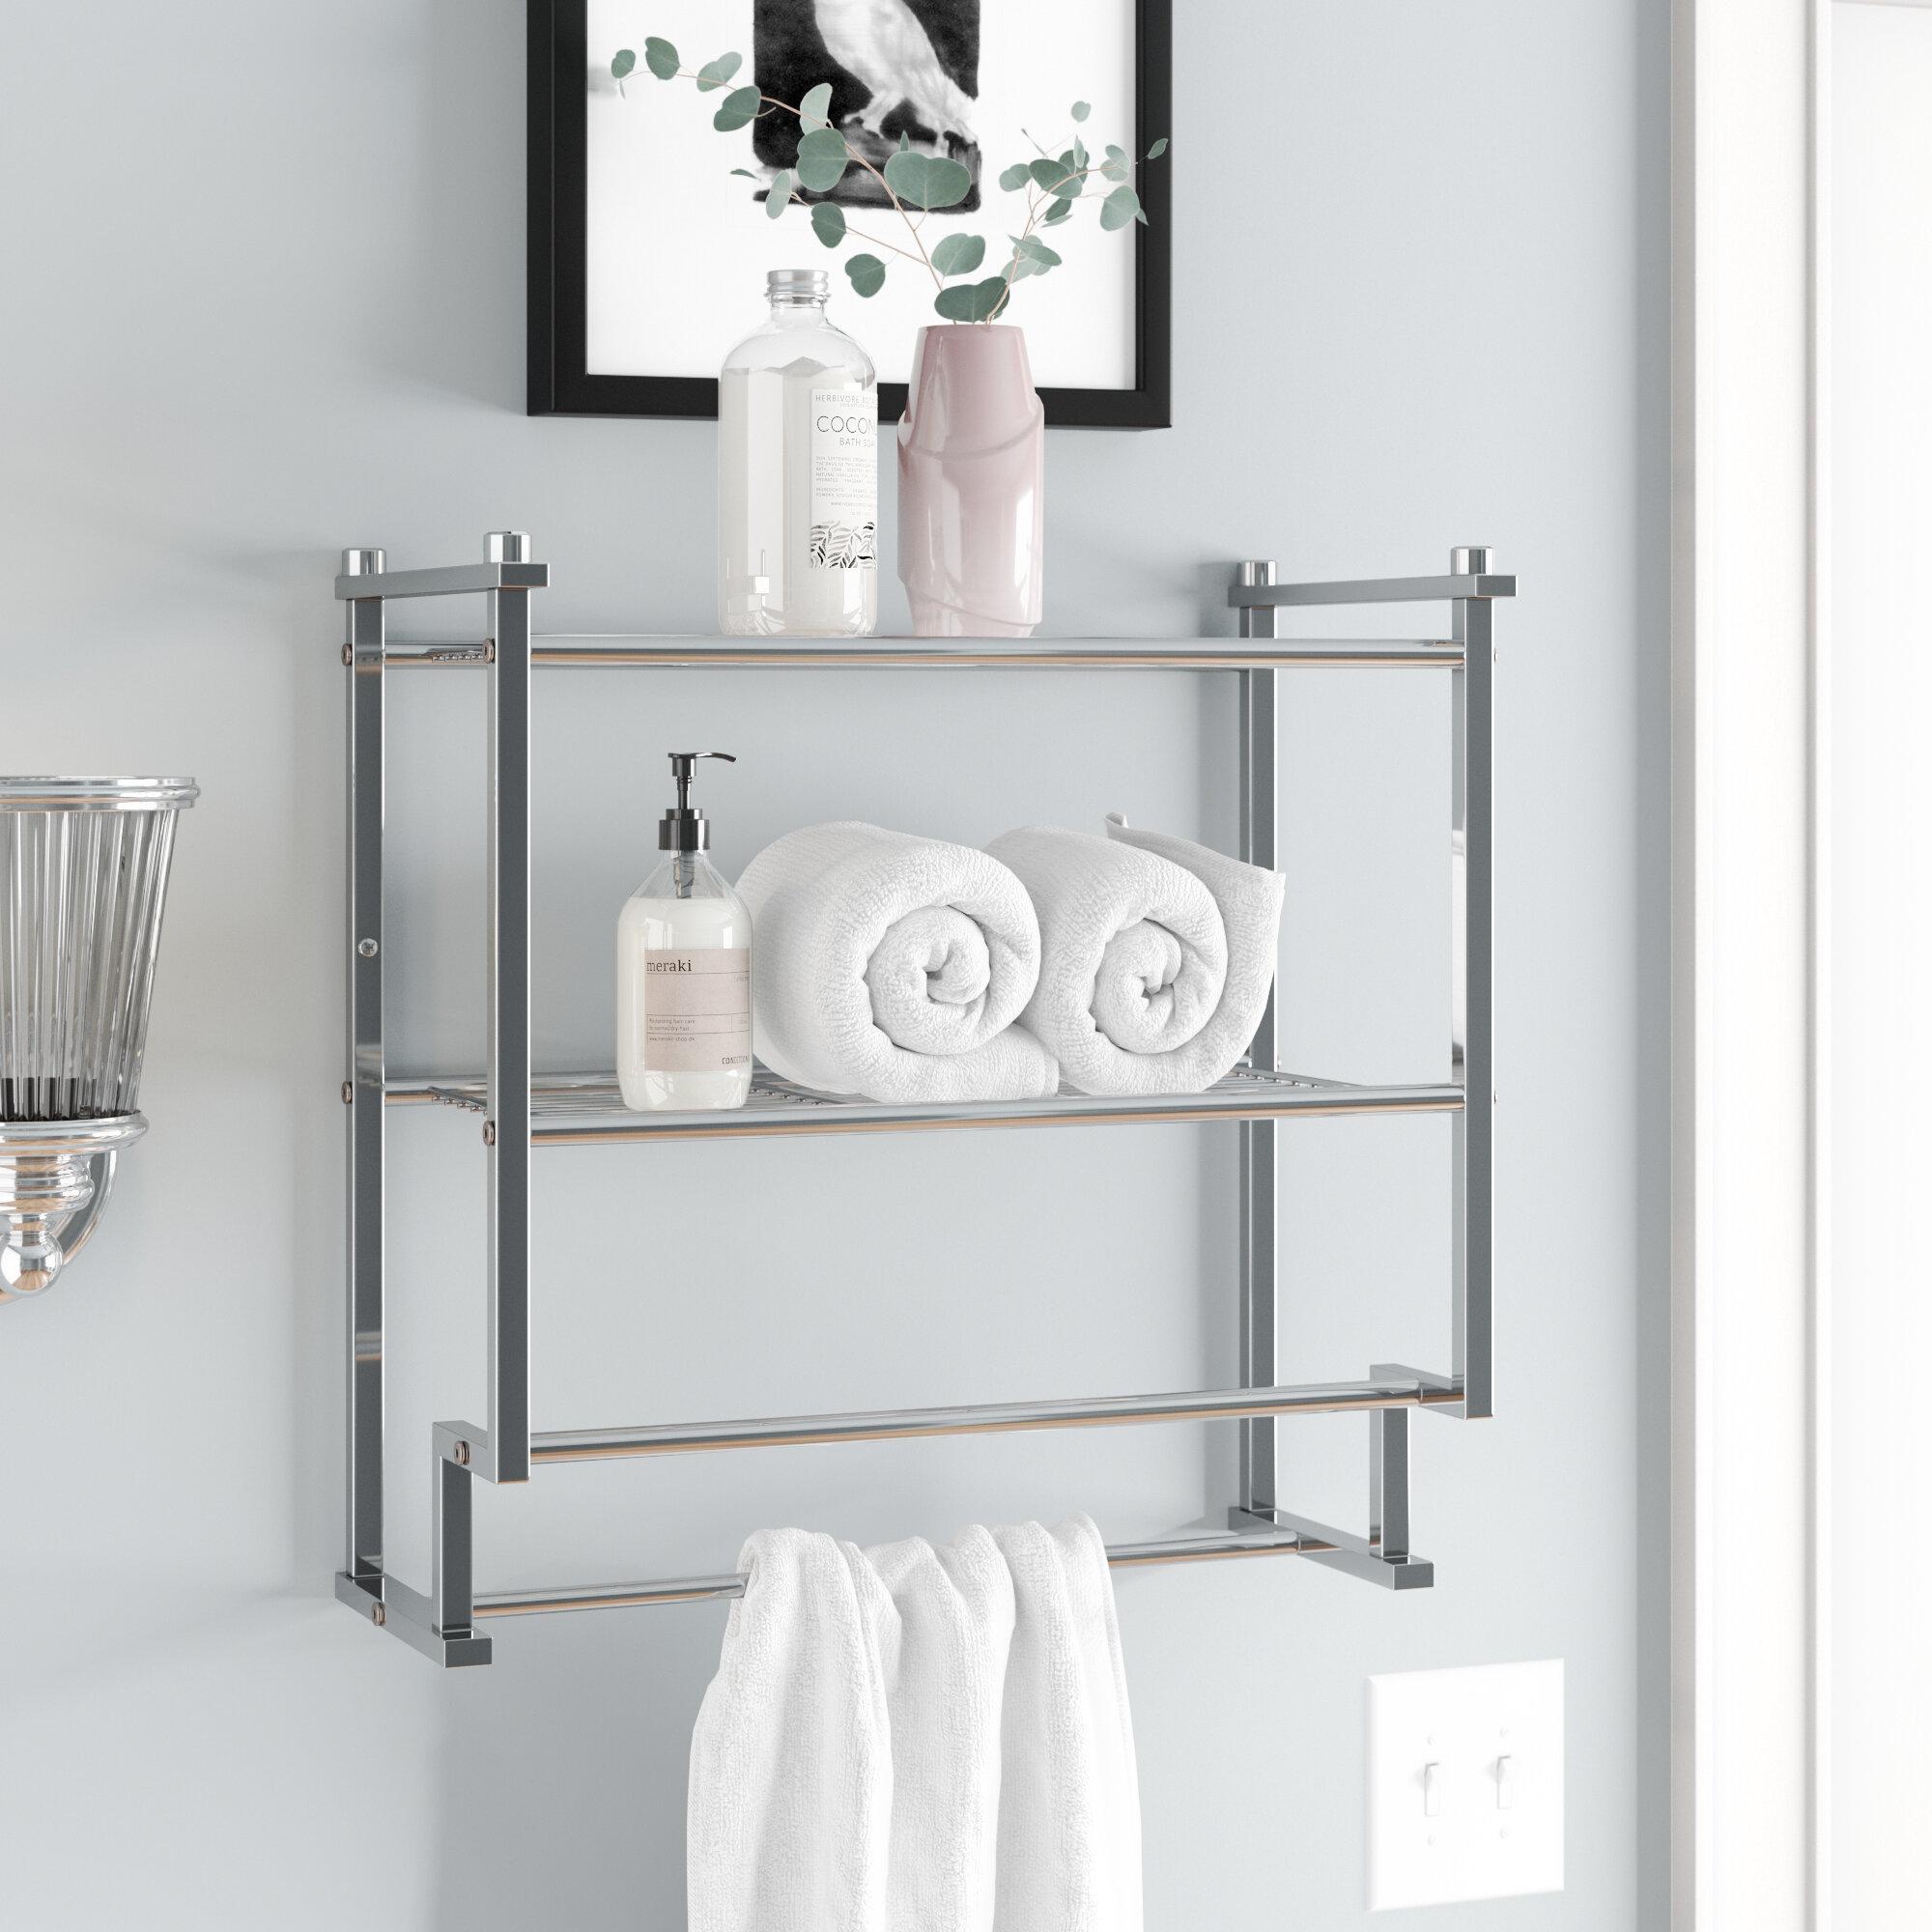 acdf9cfe440a2 The Twillery Co. Hedvige Wall Shelf   Reviews